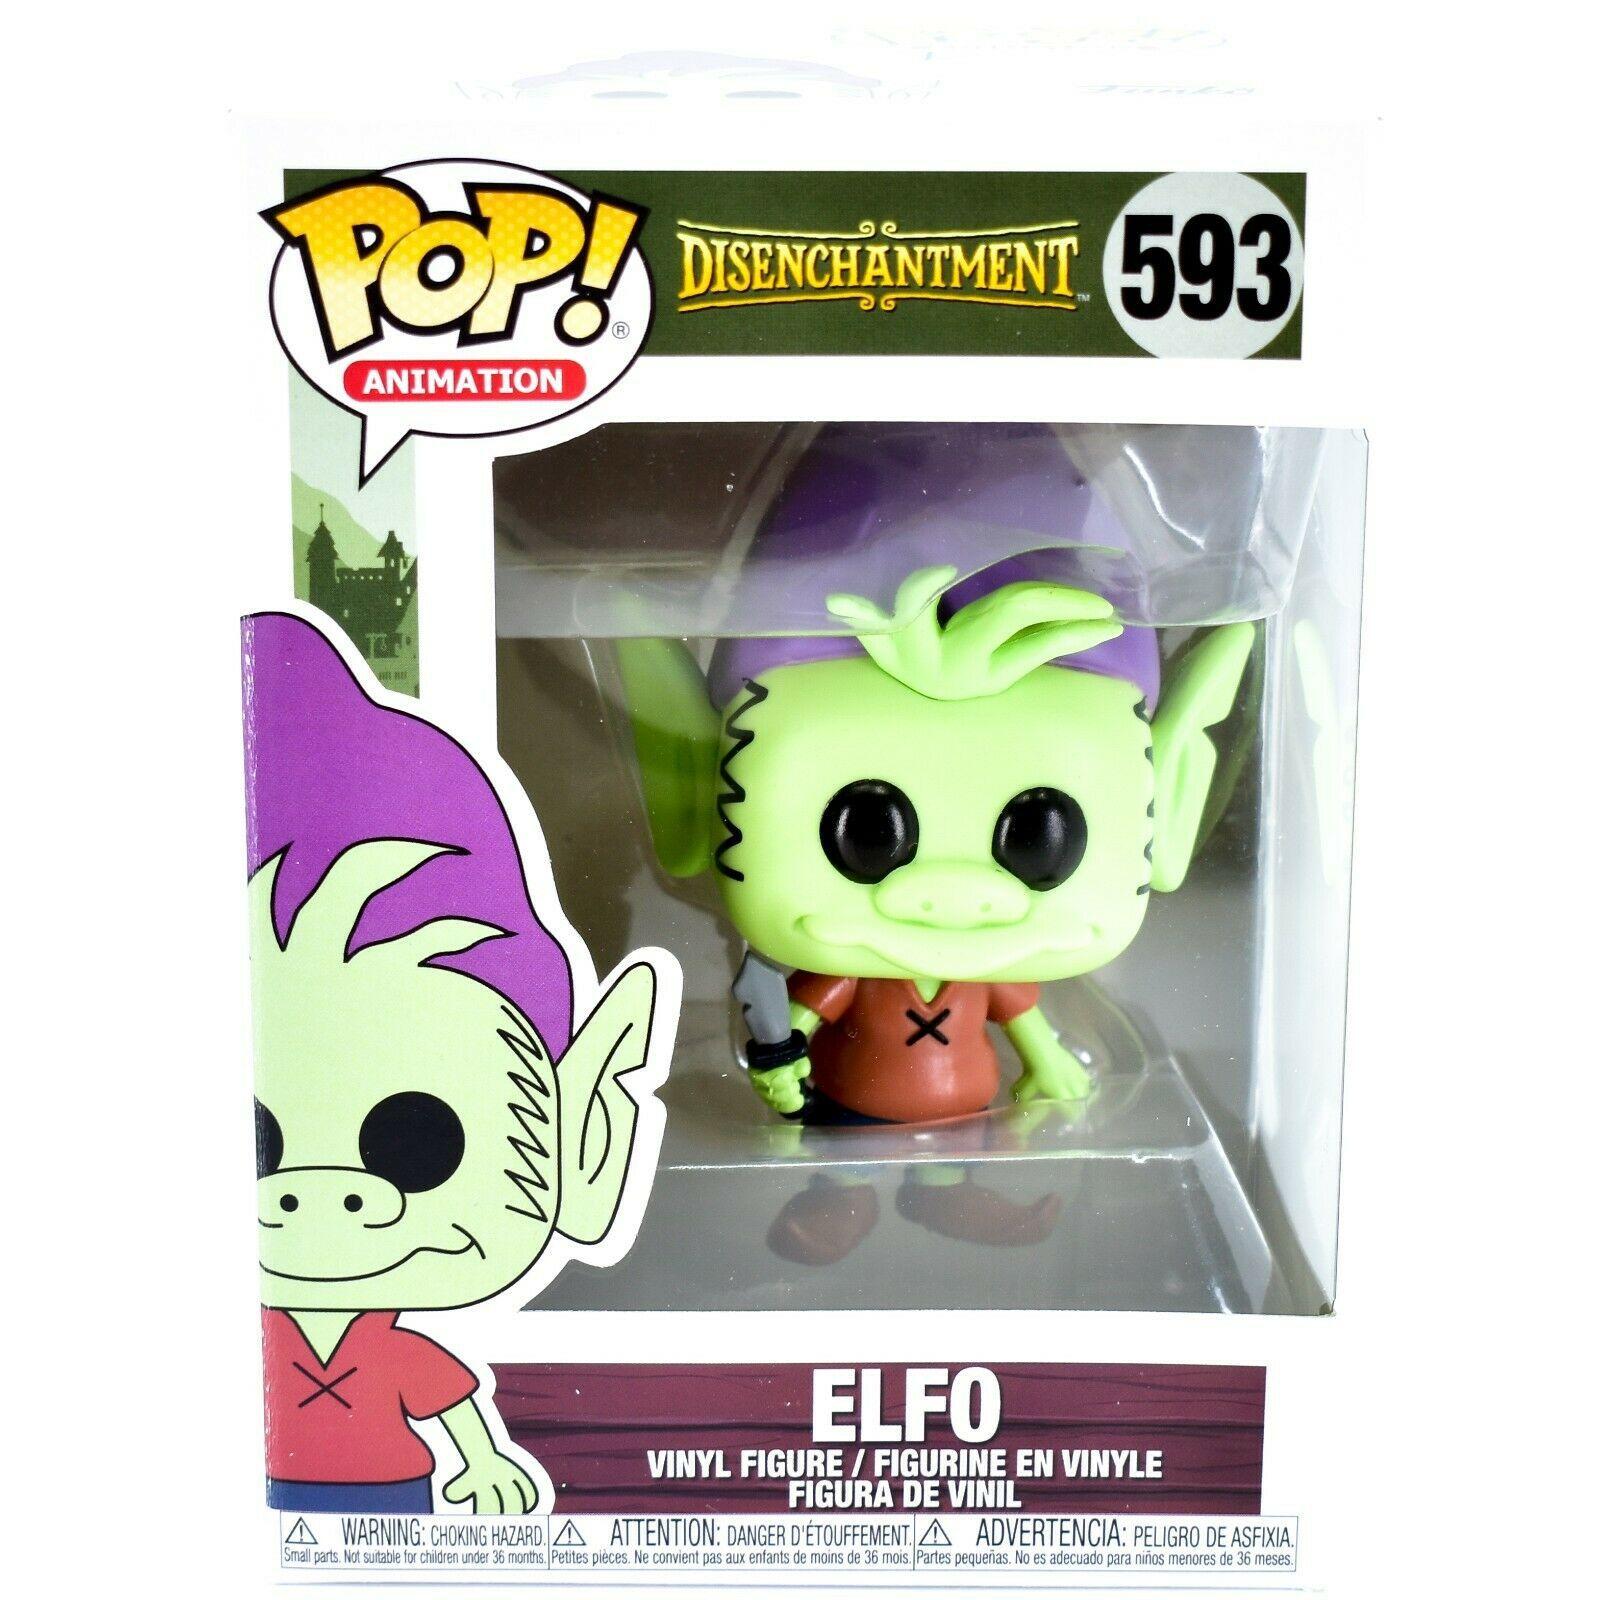 Funko Pop! Animation Disenchantment Elfo #593 Vinyl Action Figure